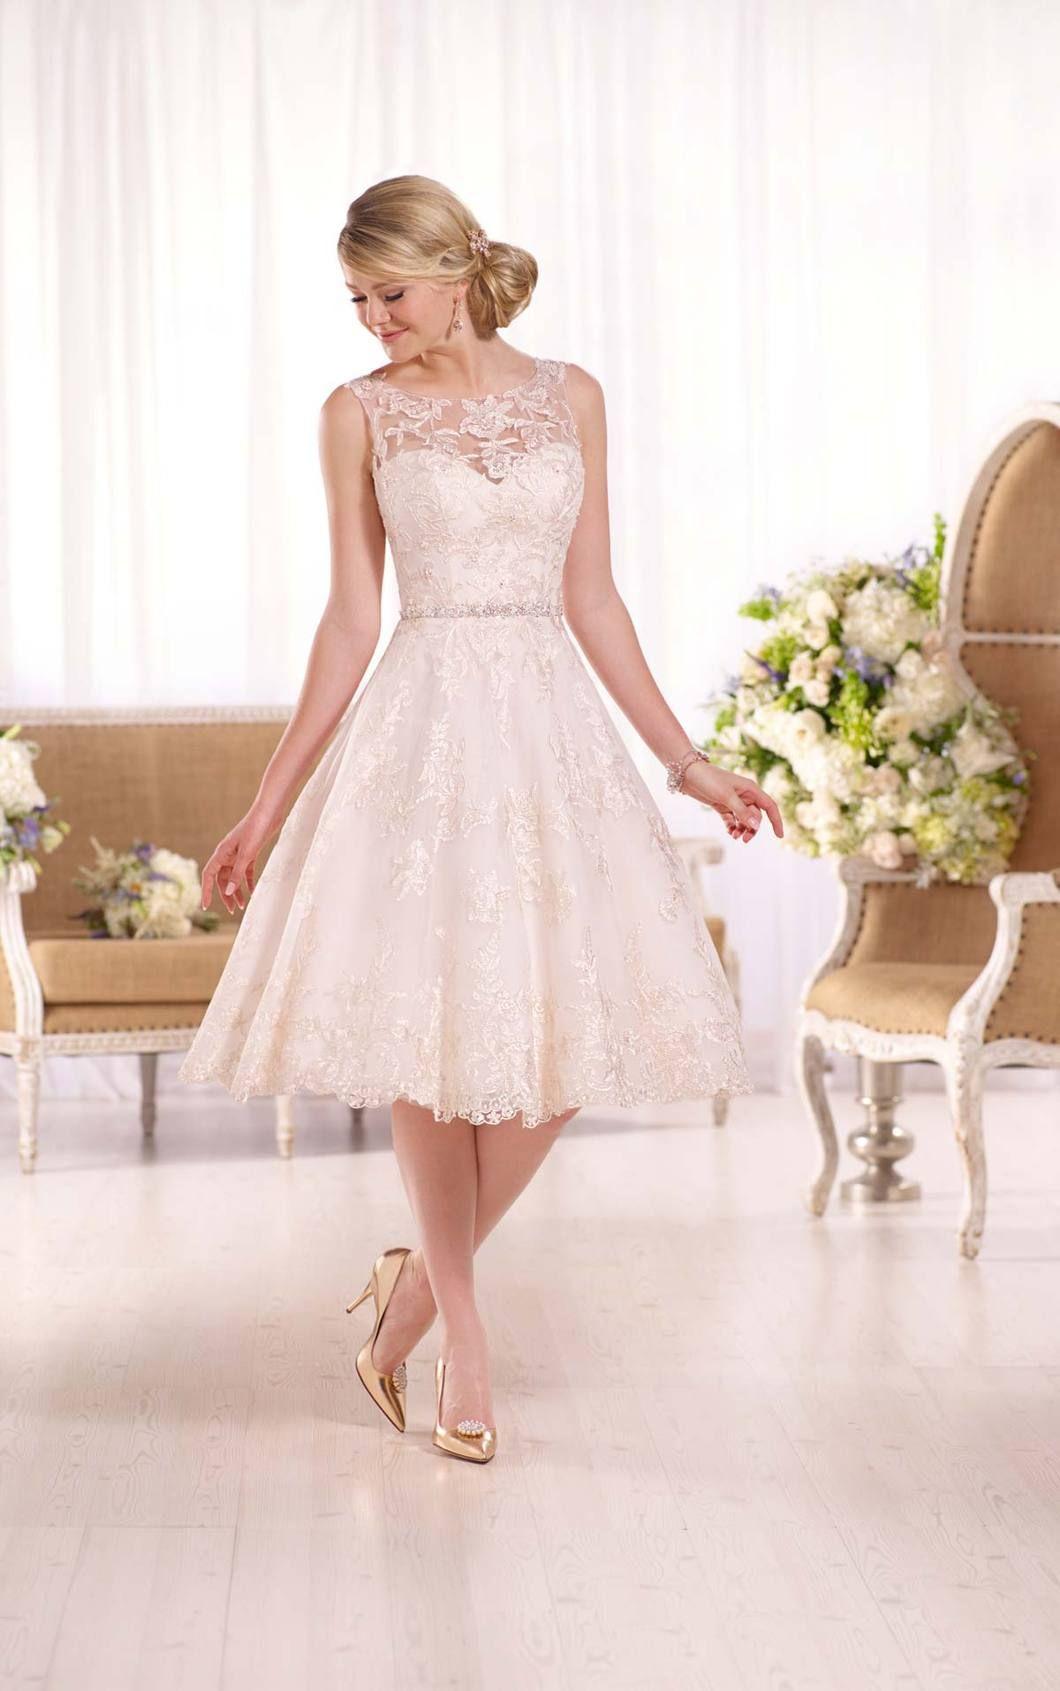 D2101 in 2020 Civil wedding dresses, Tea length wedding